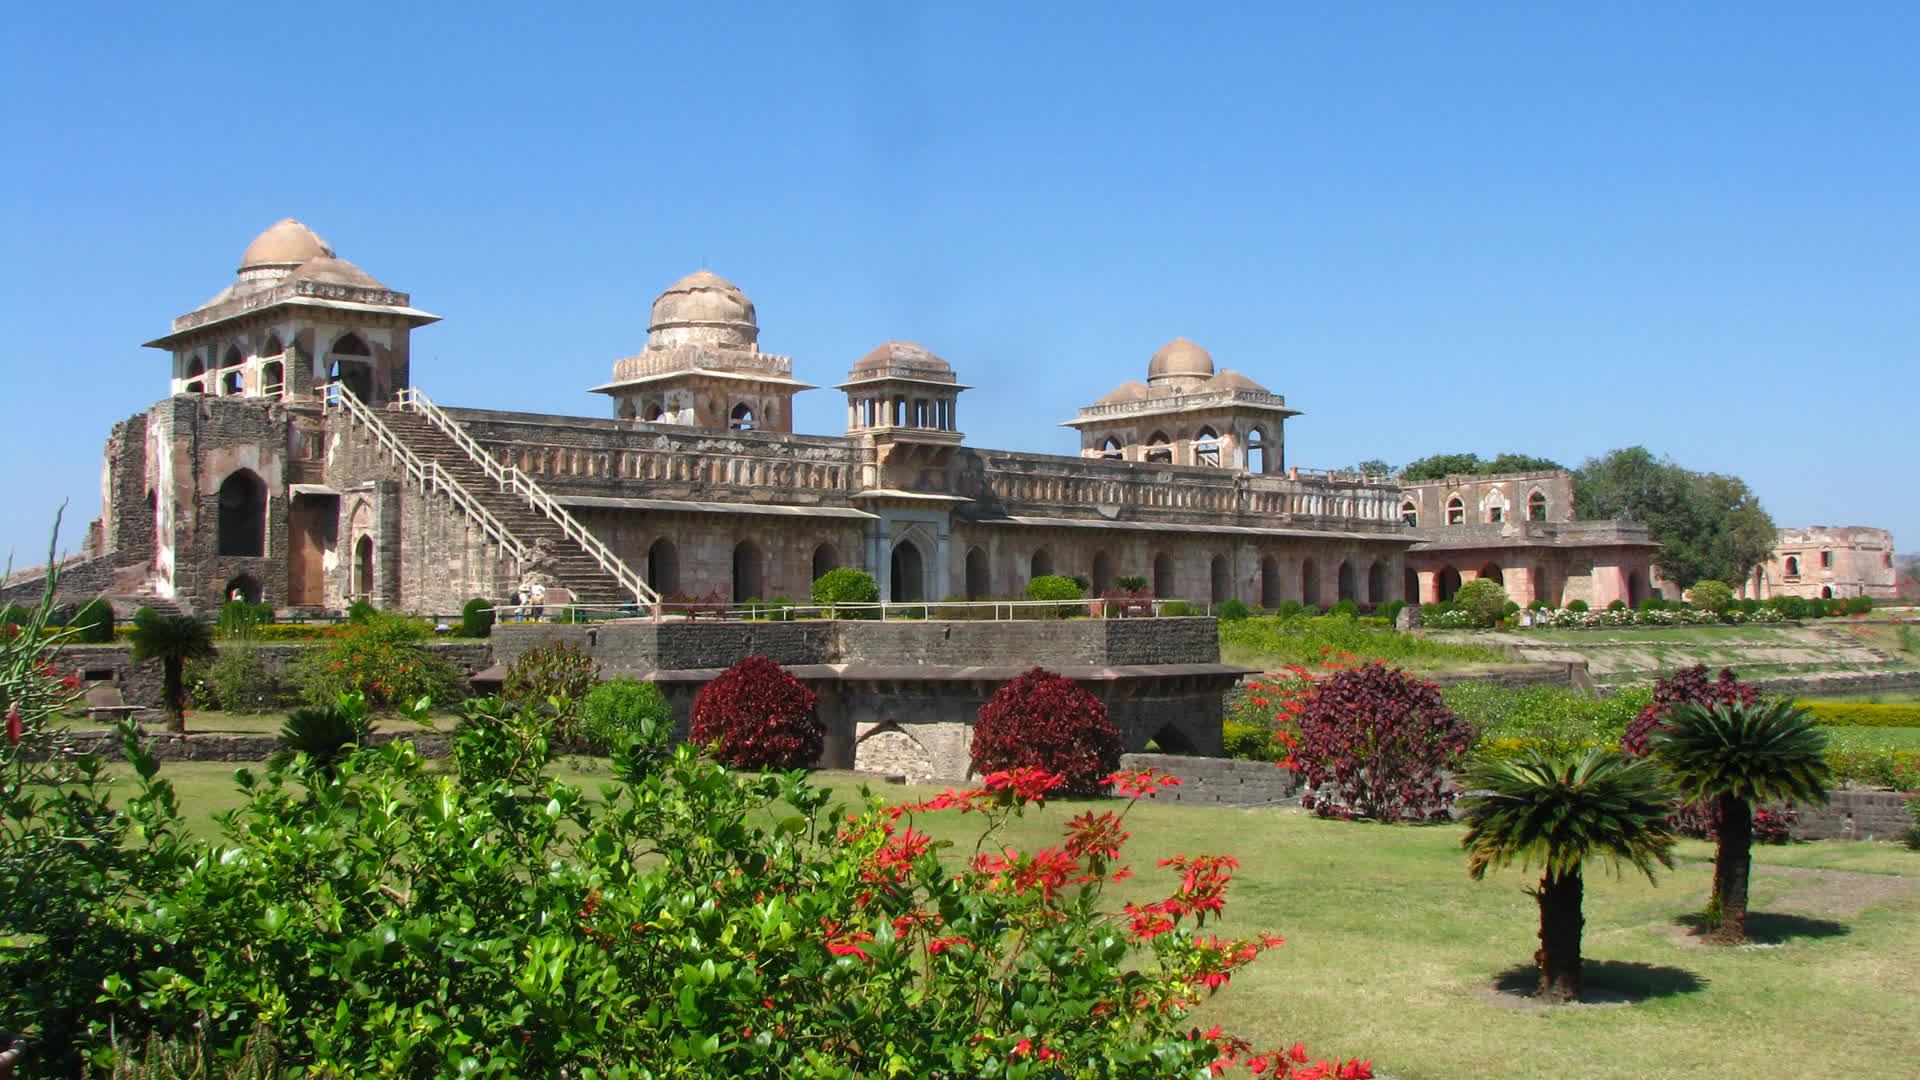 Mandu: Pride of the Malwa Sultans